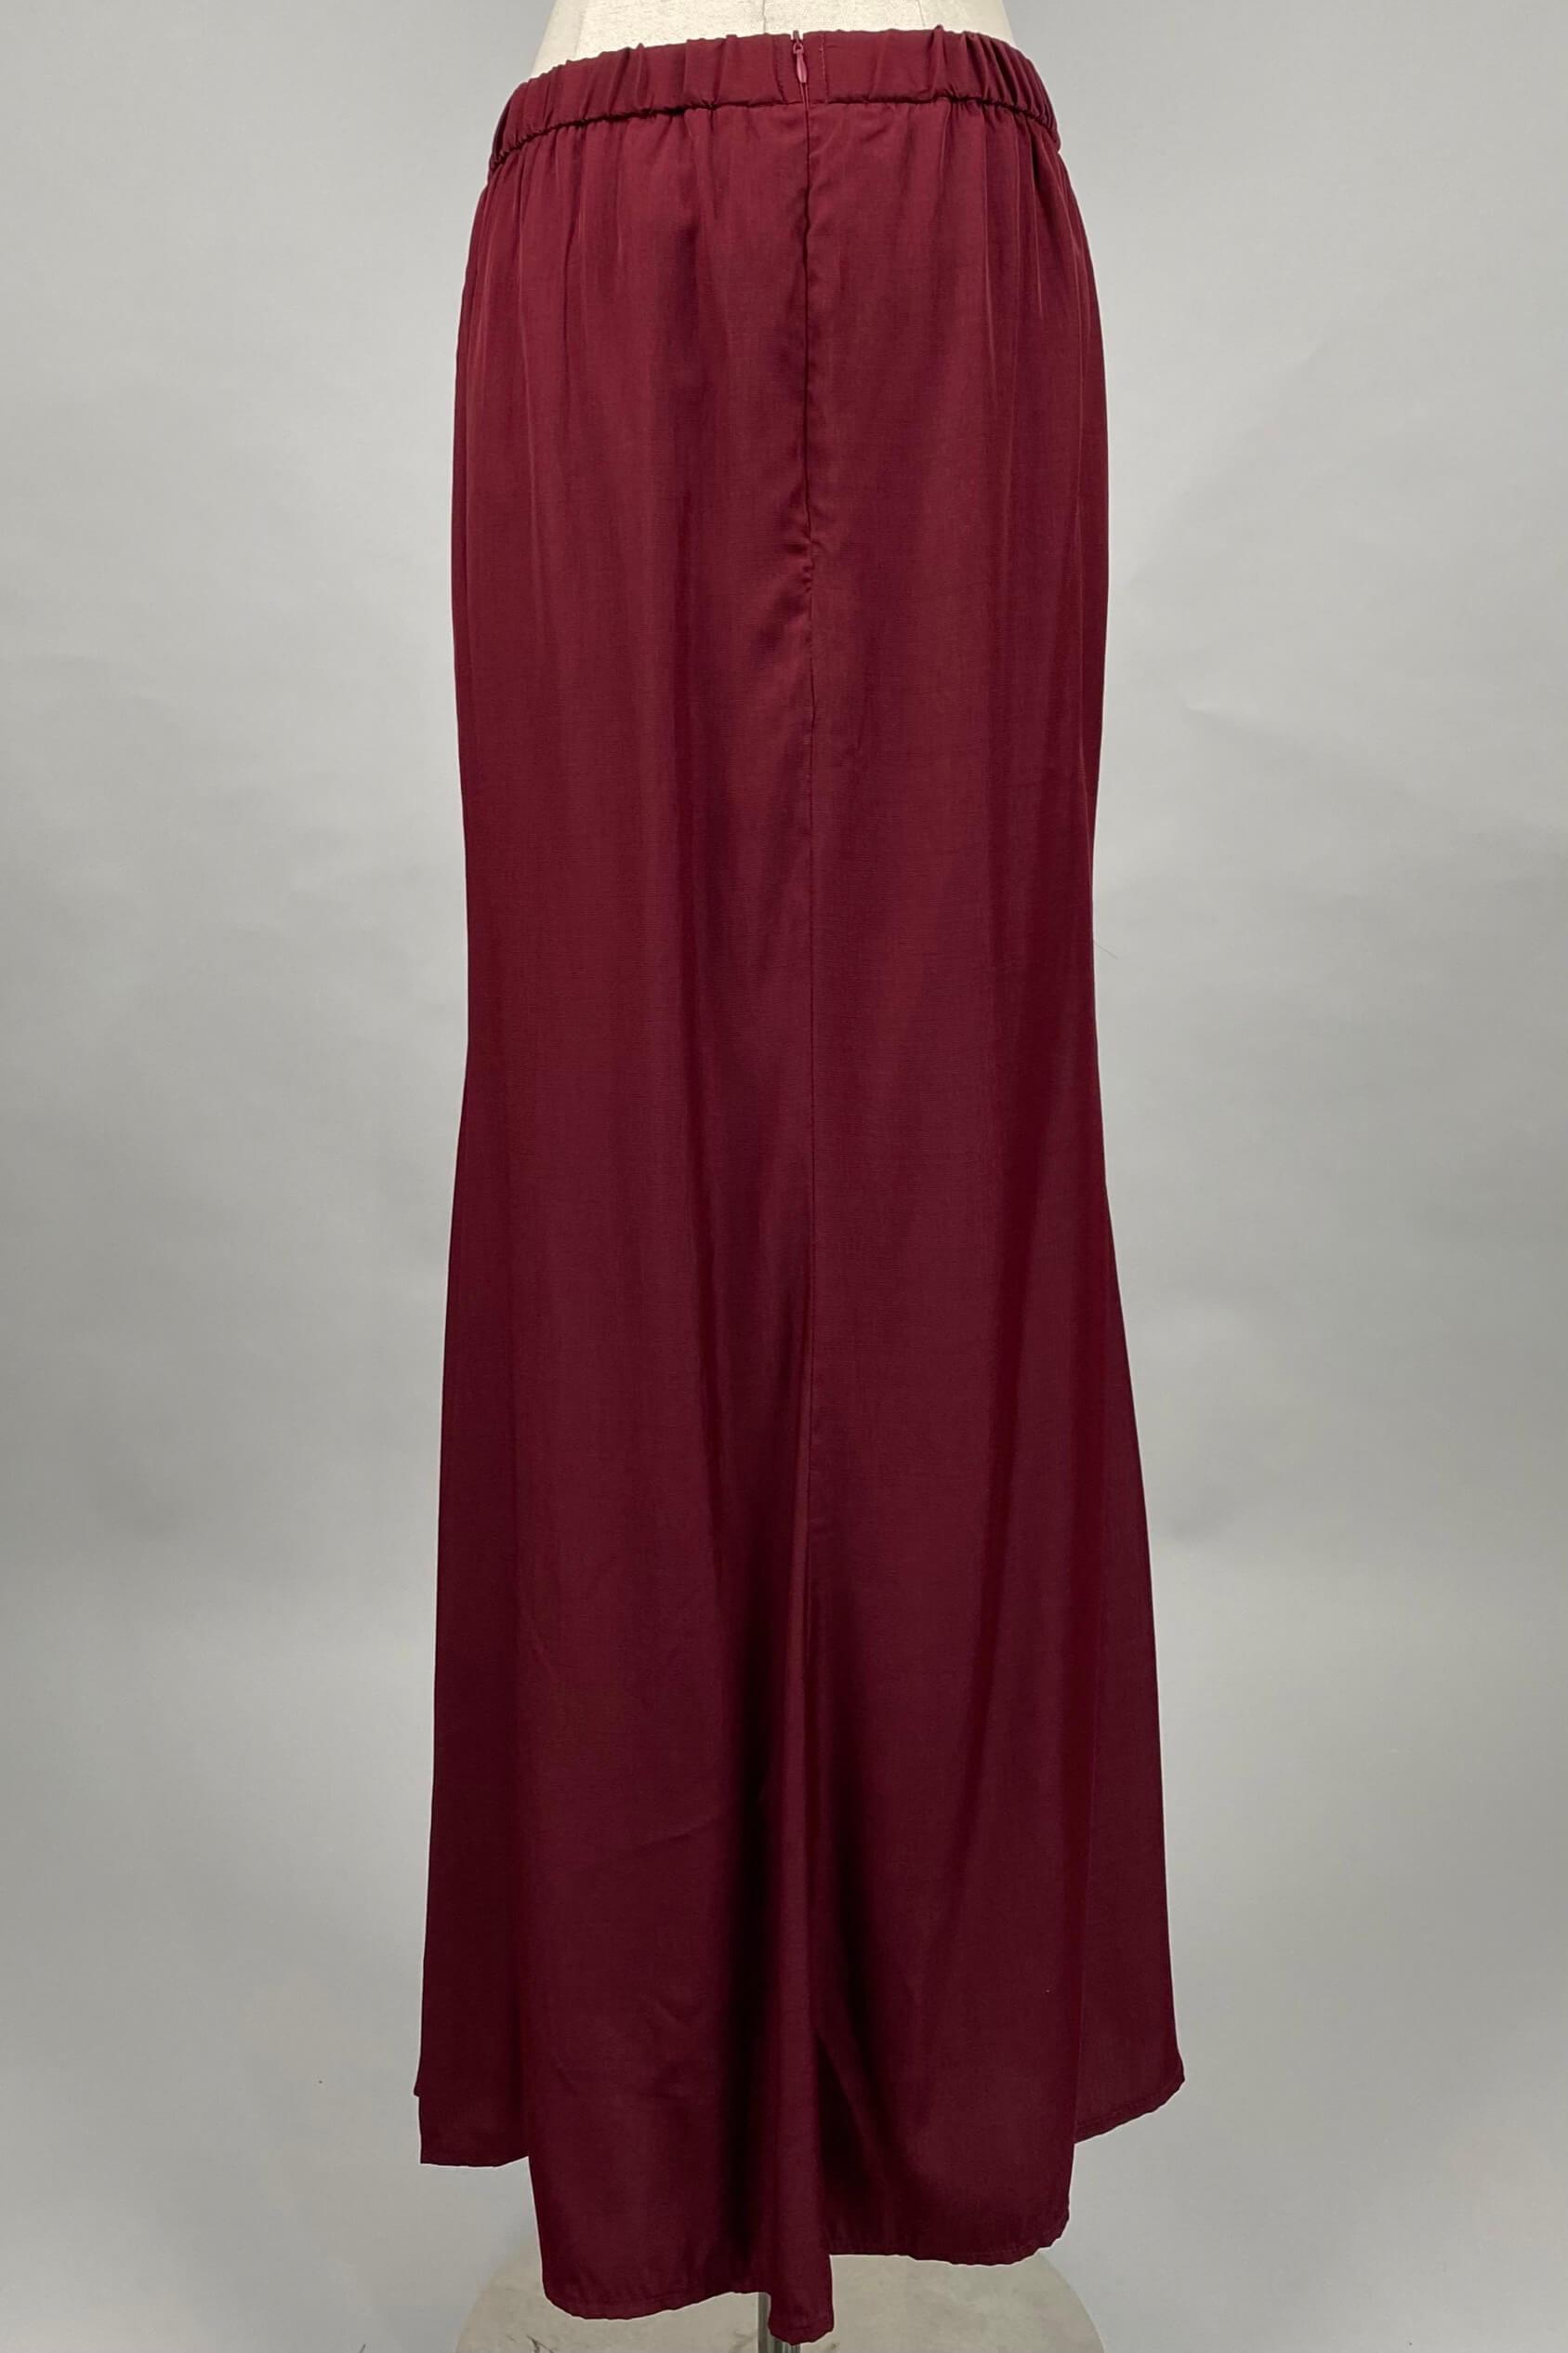 Dark Maroon Skirt 4